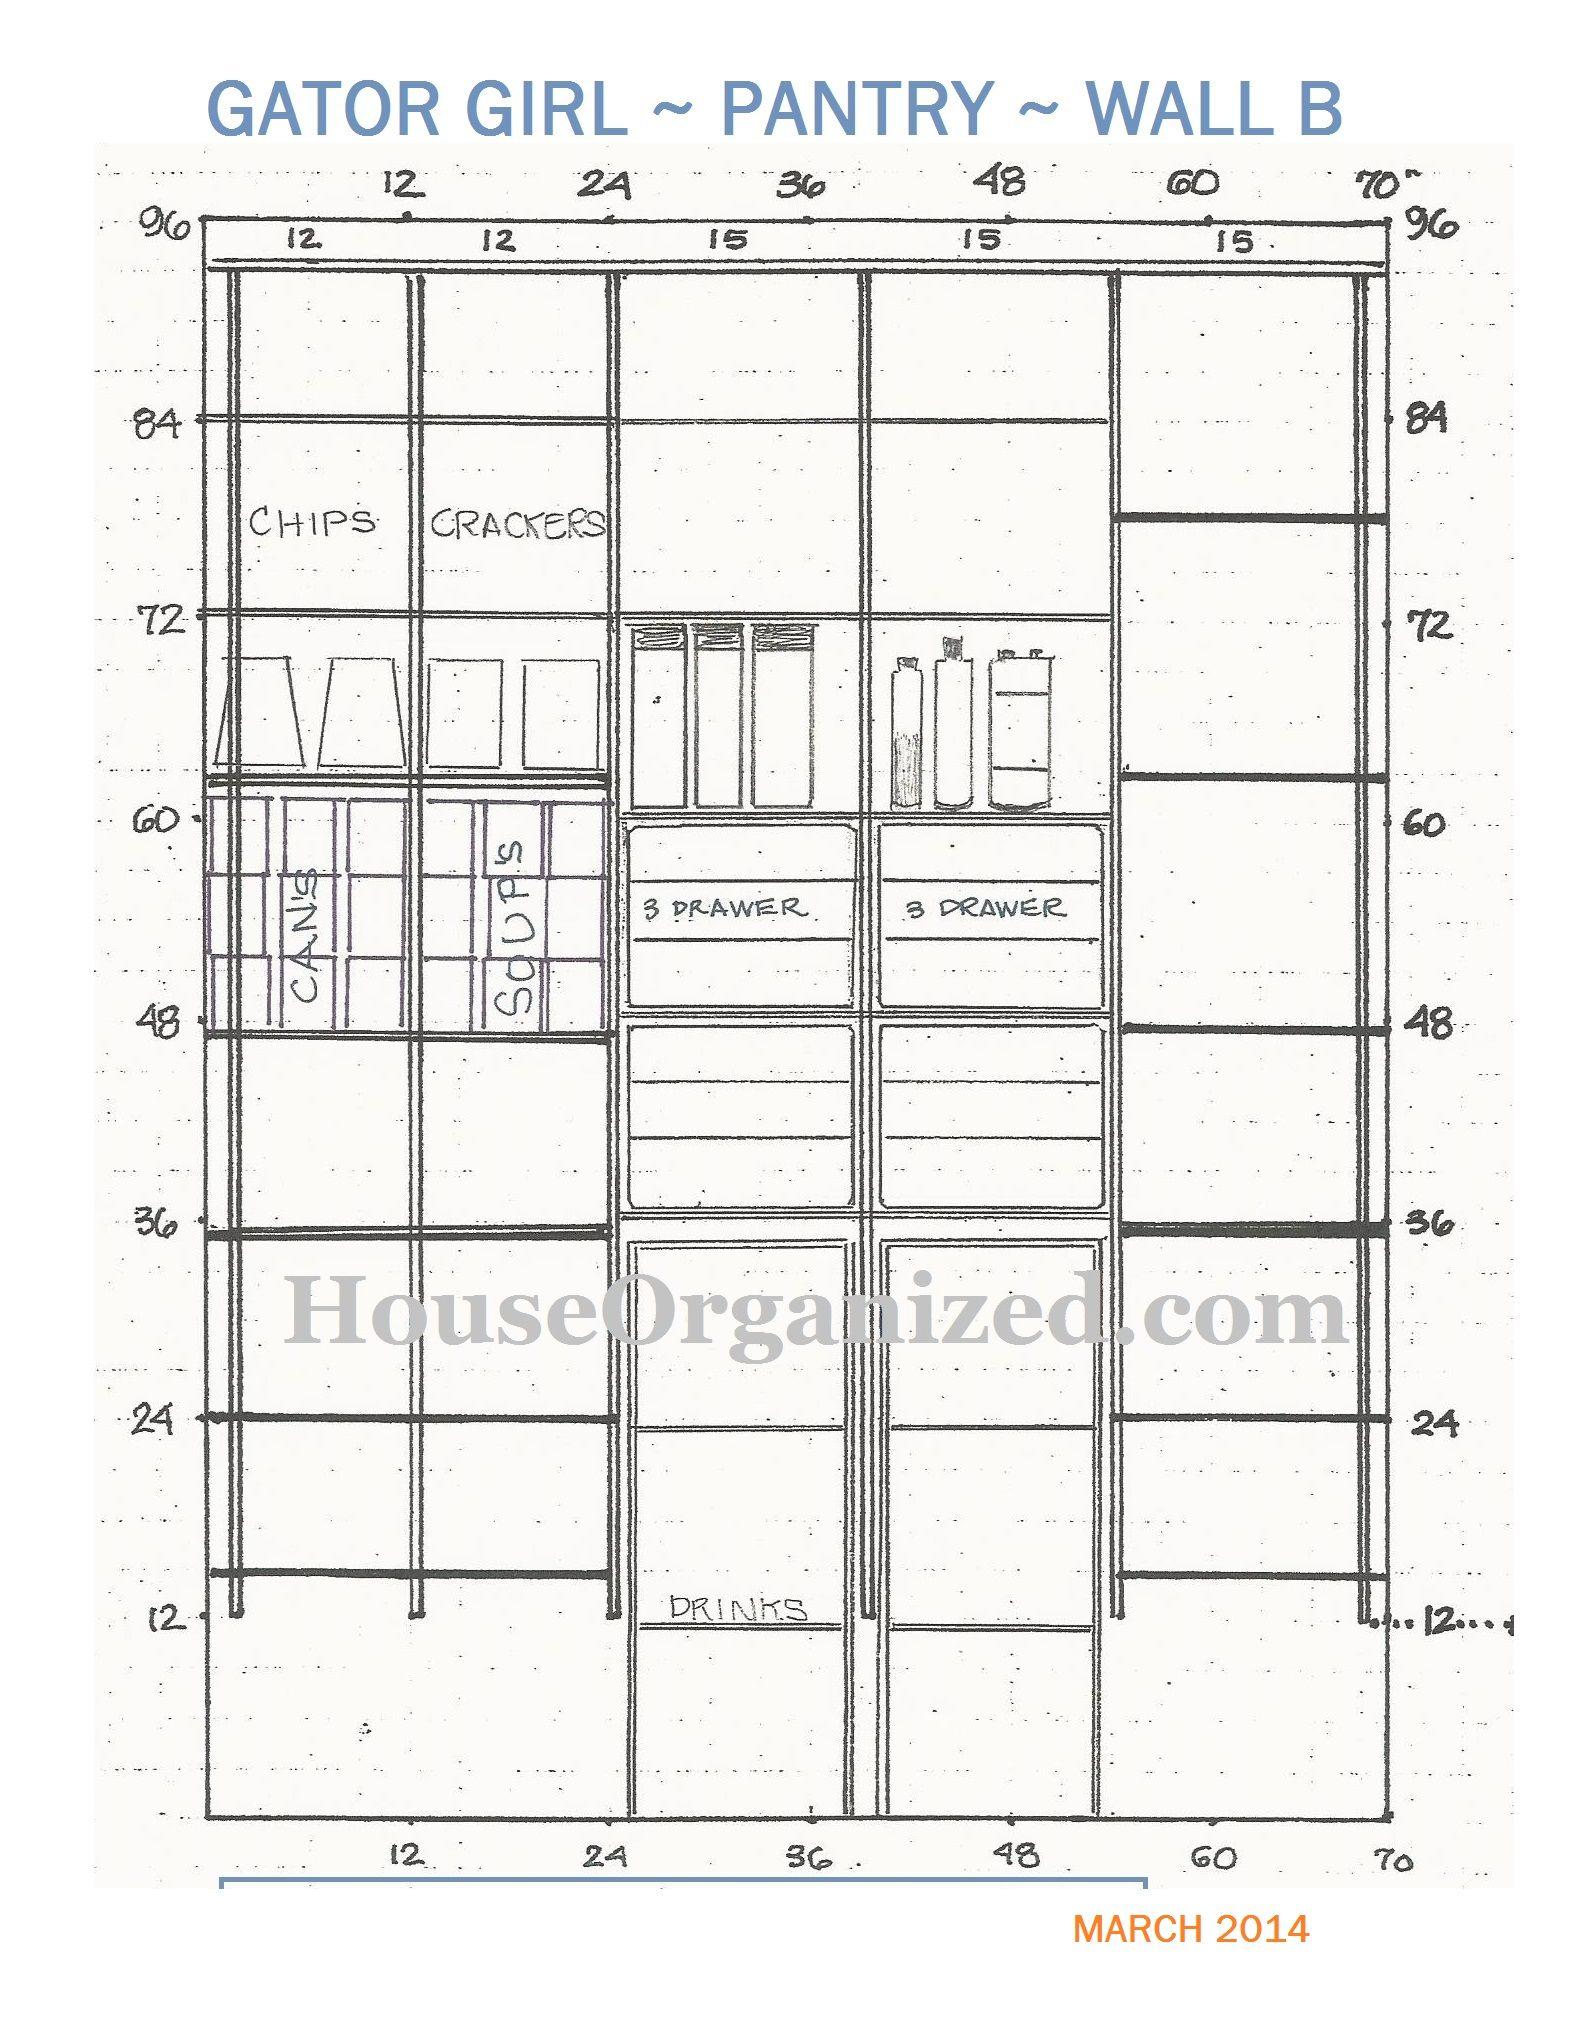 Gator Girl #pantry renovation. Wall B #HouseOrganized.com schematic ...